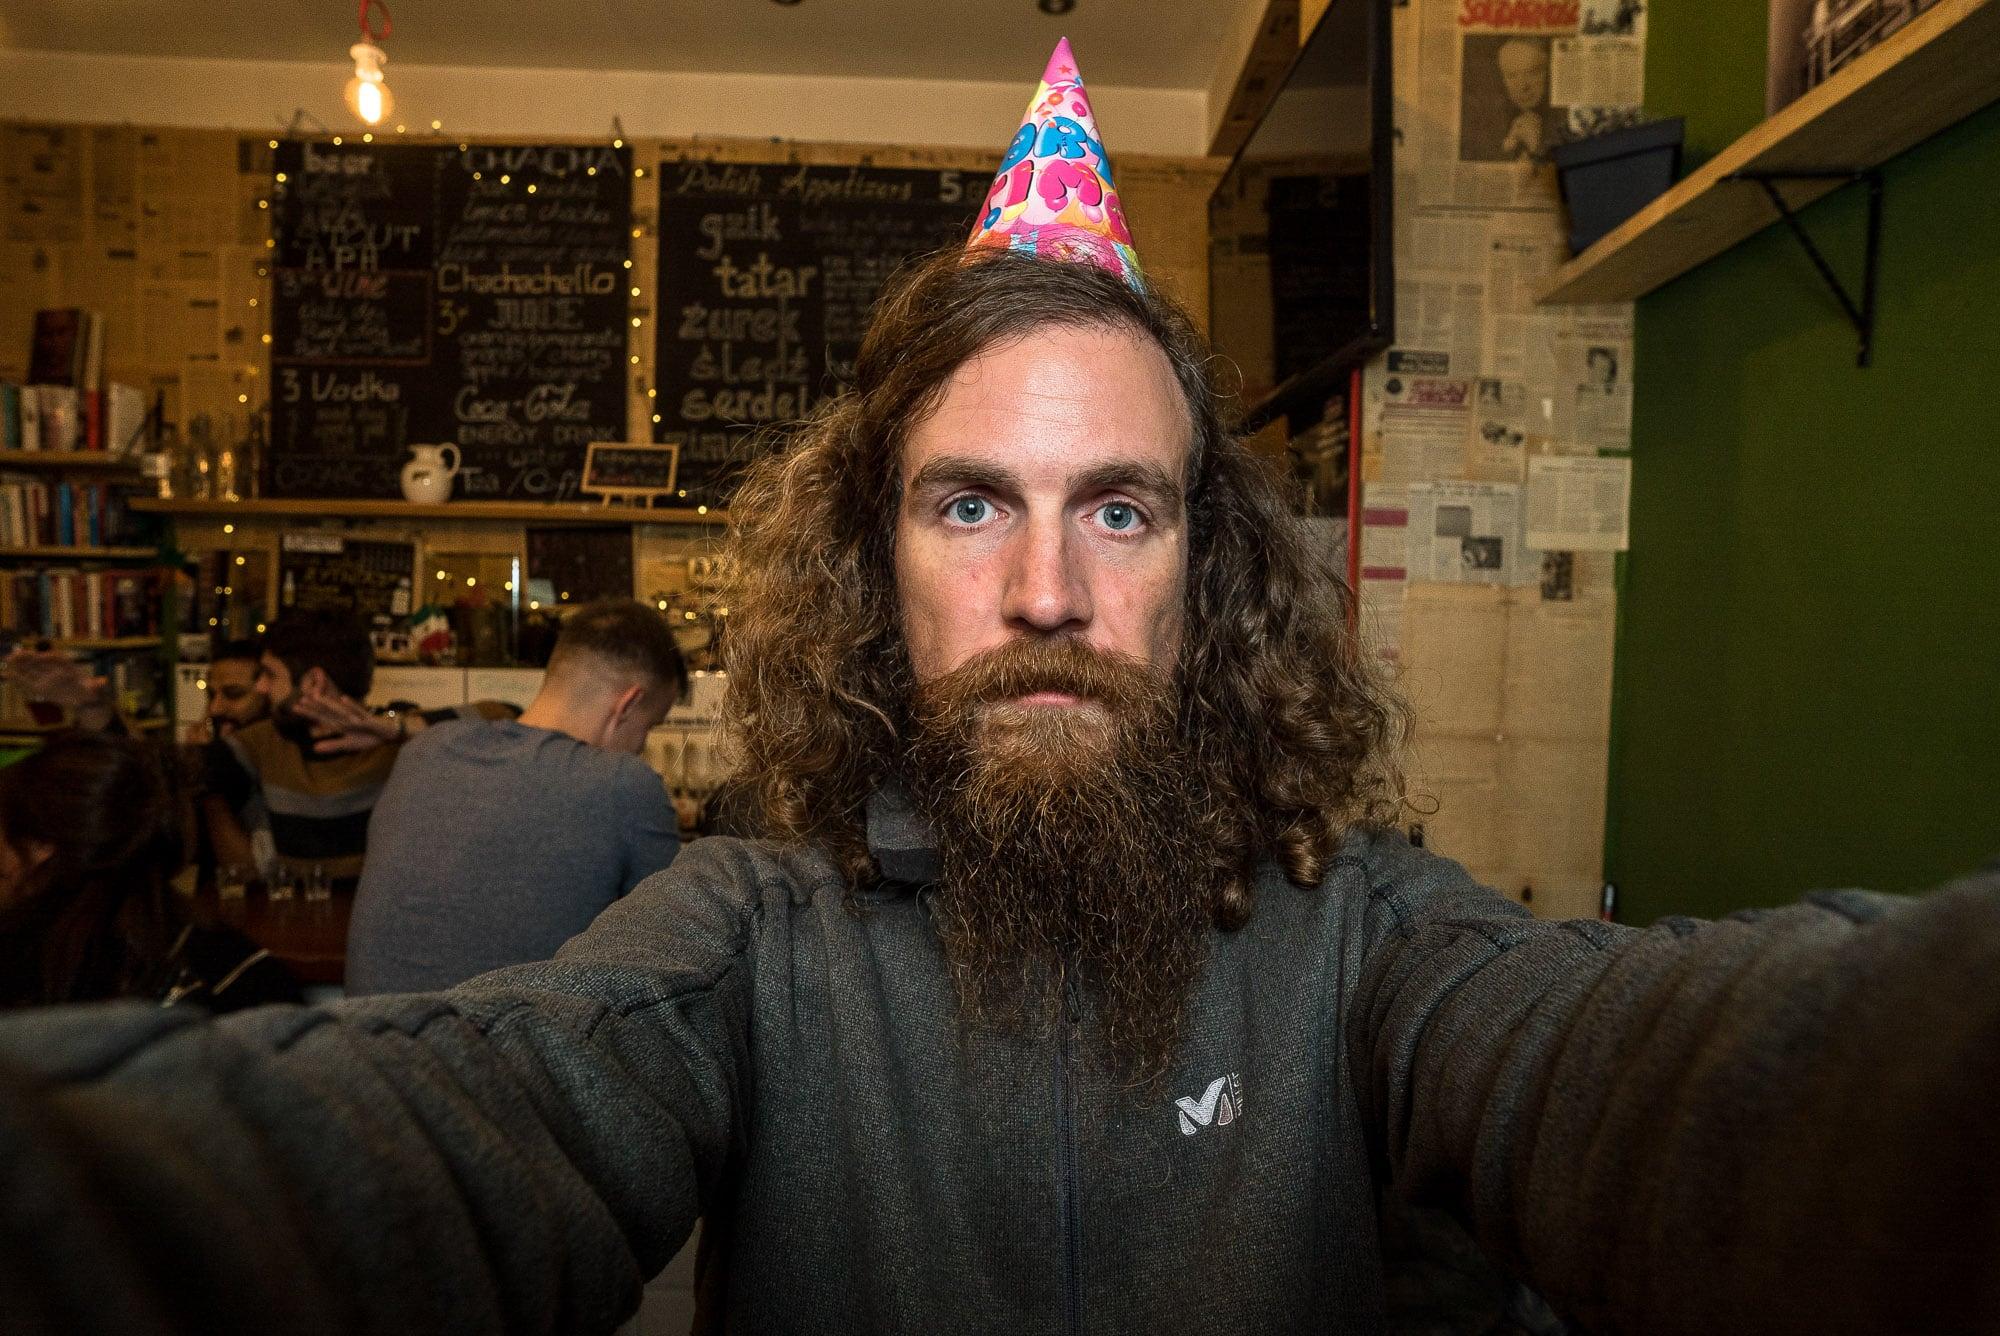 37th birthday